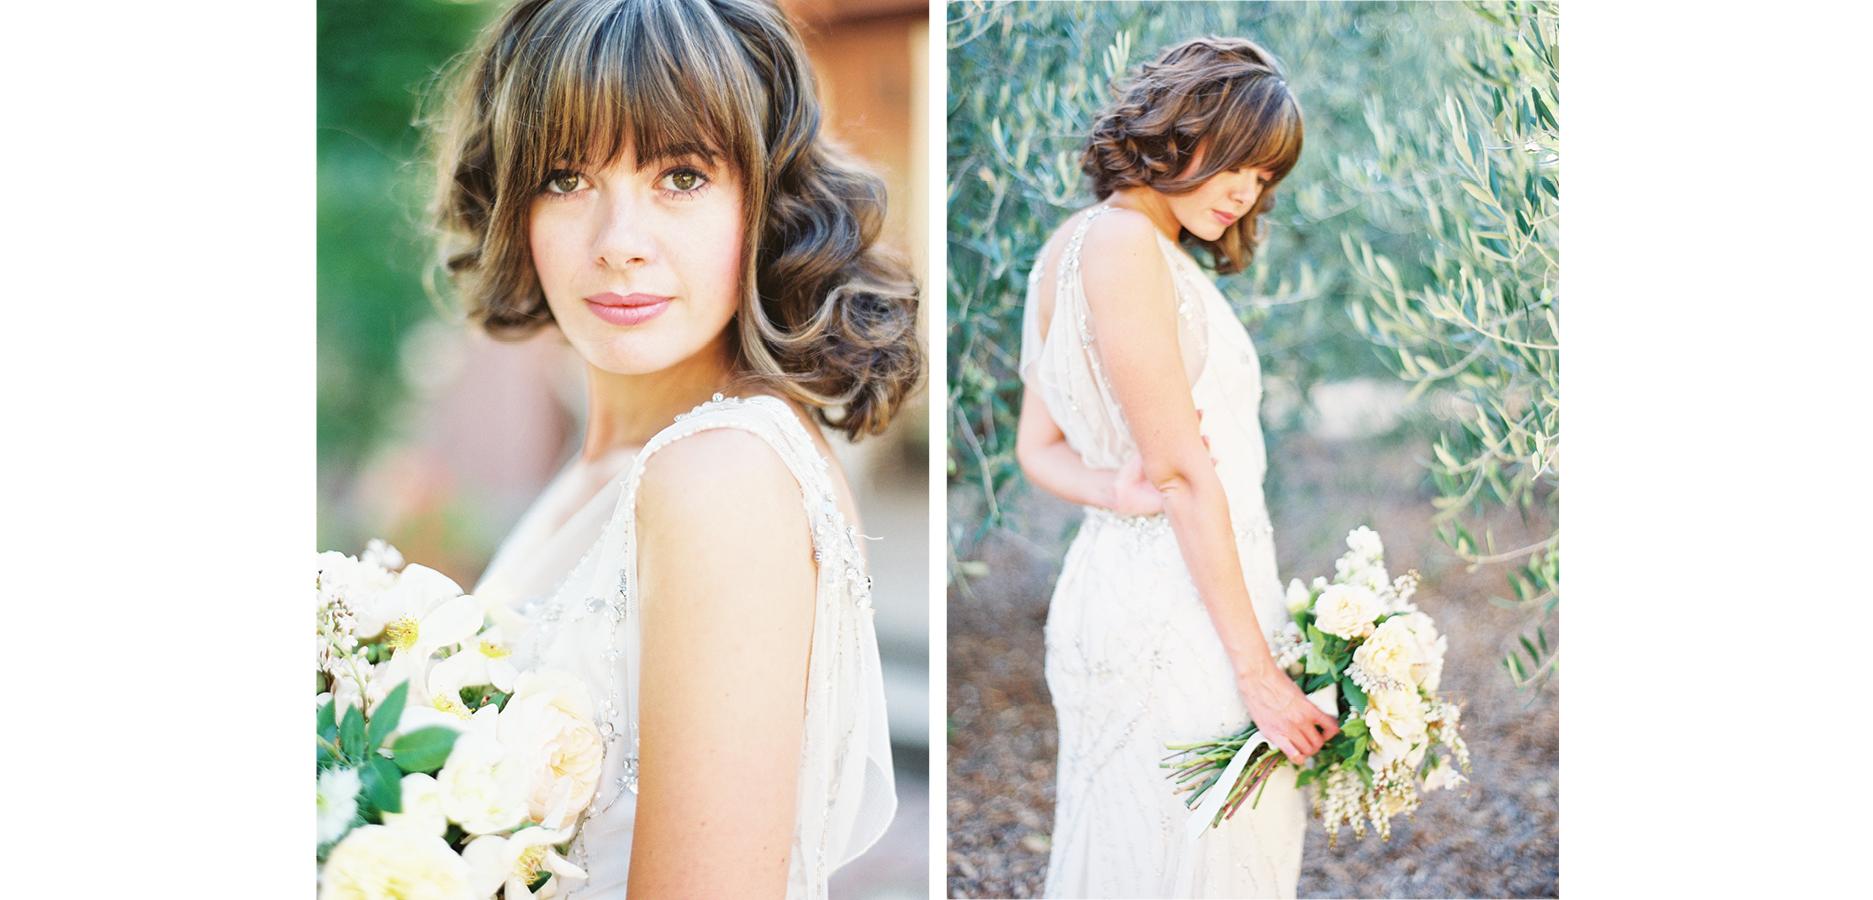 Jess-Wilcox-Hair-Makeup-Wedding_portfolio7.jpg